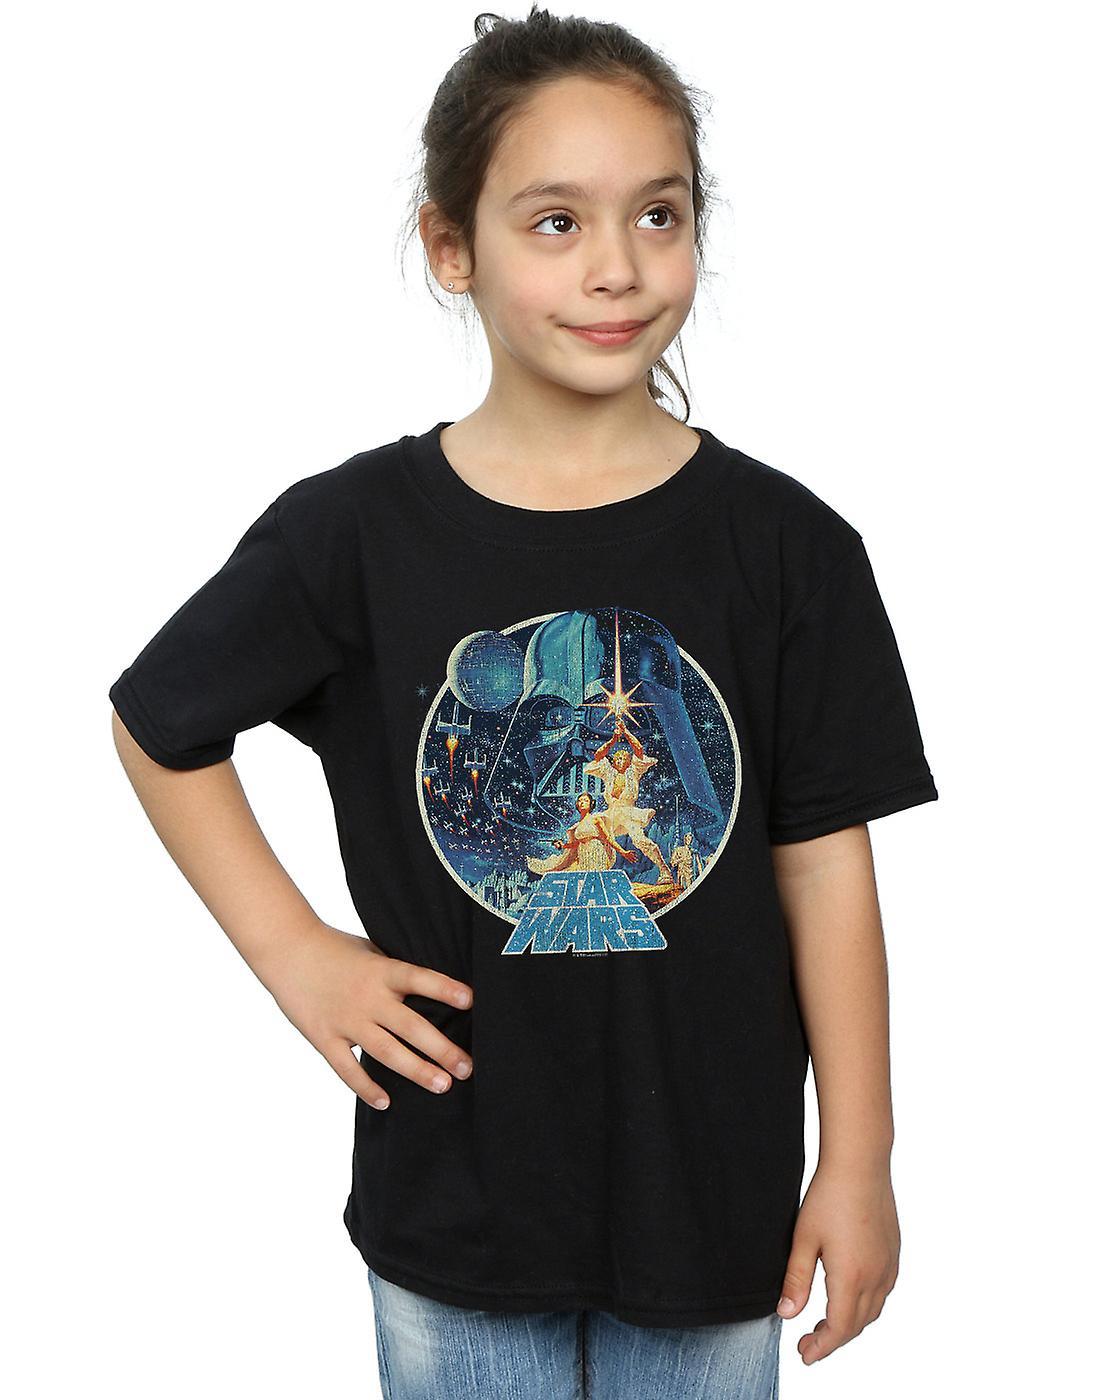 Star Wars Girls Vintage Victory T-Shirt